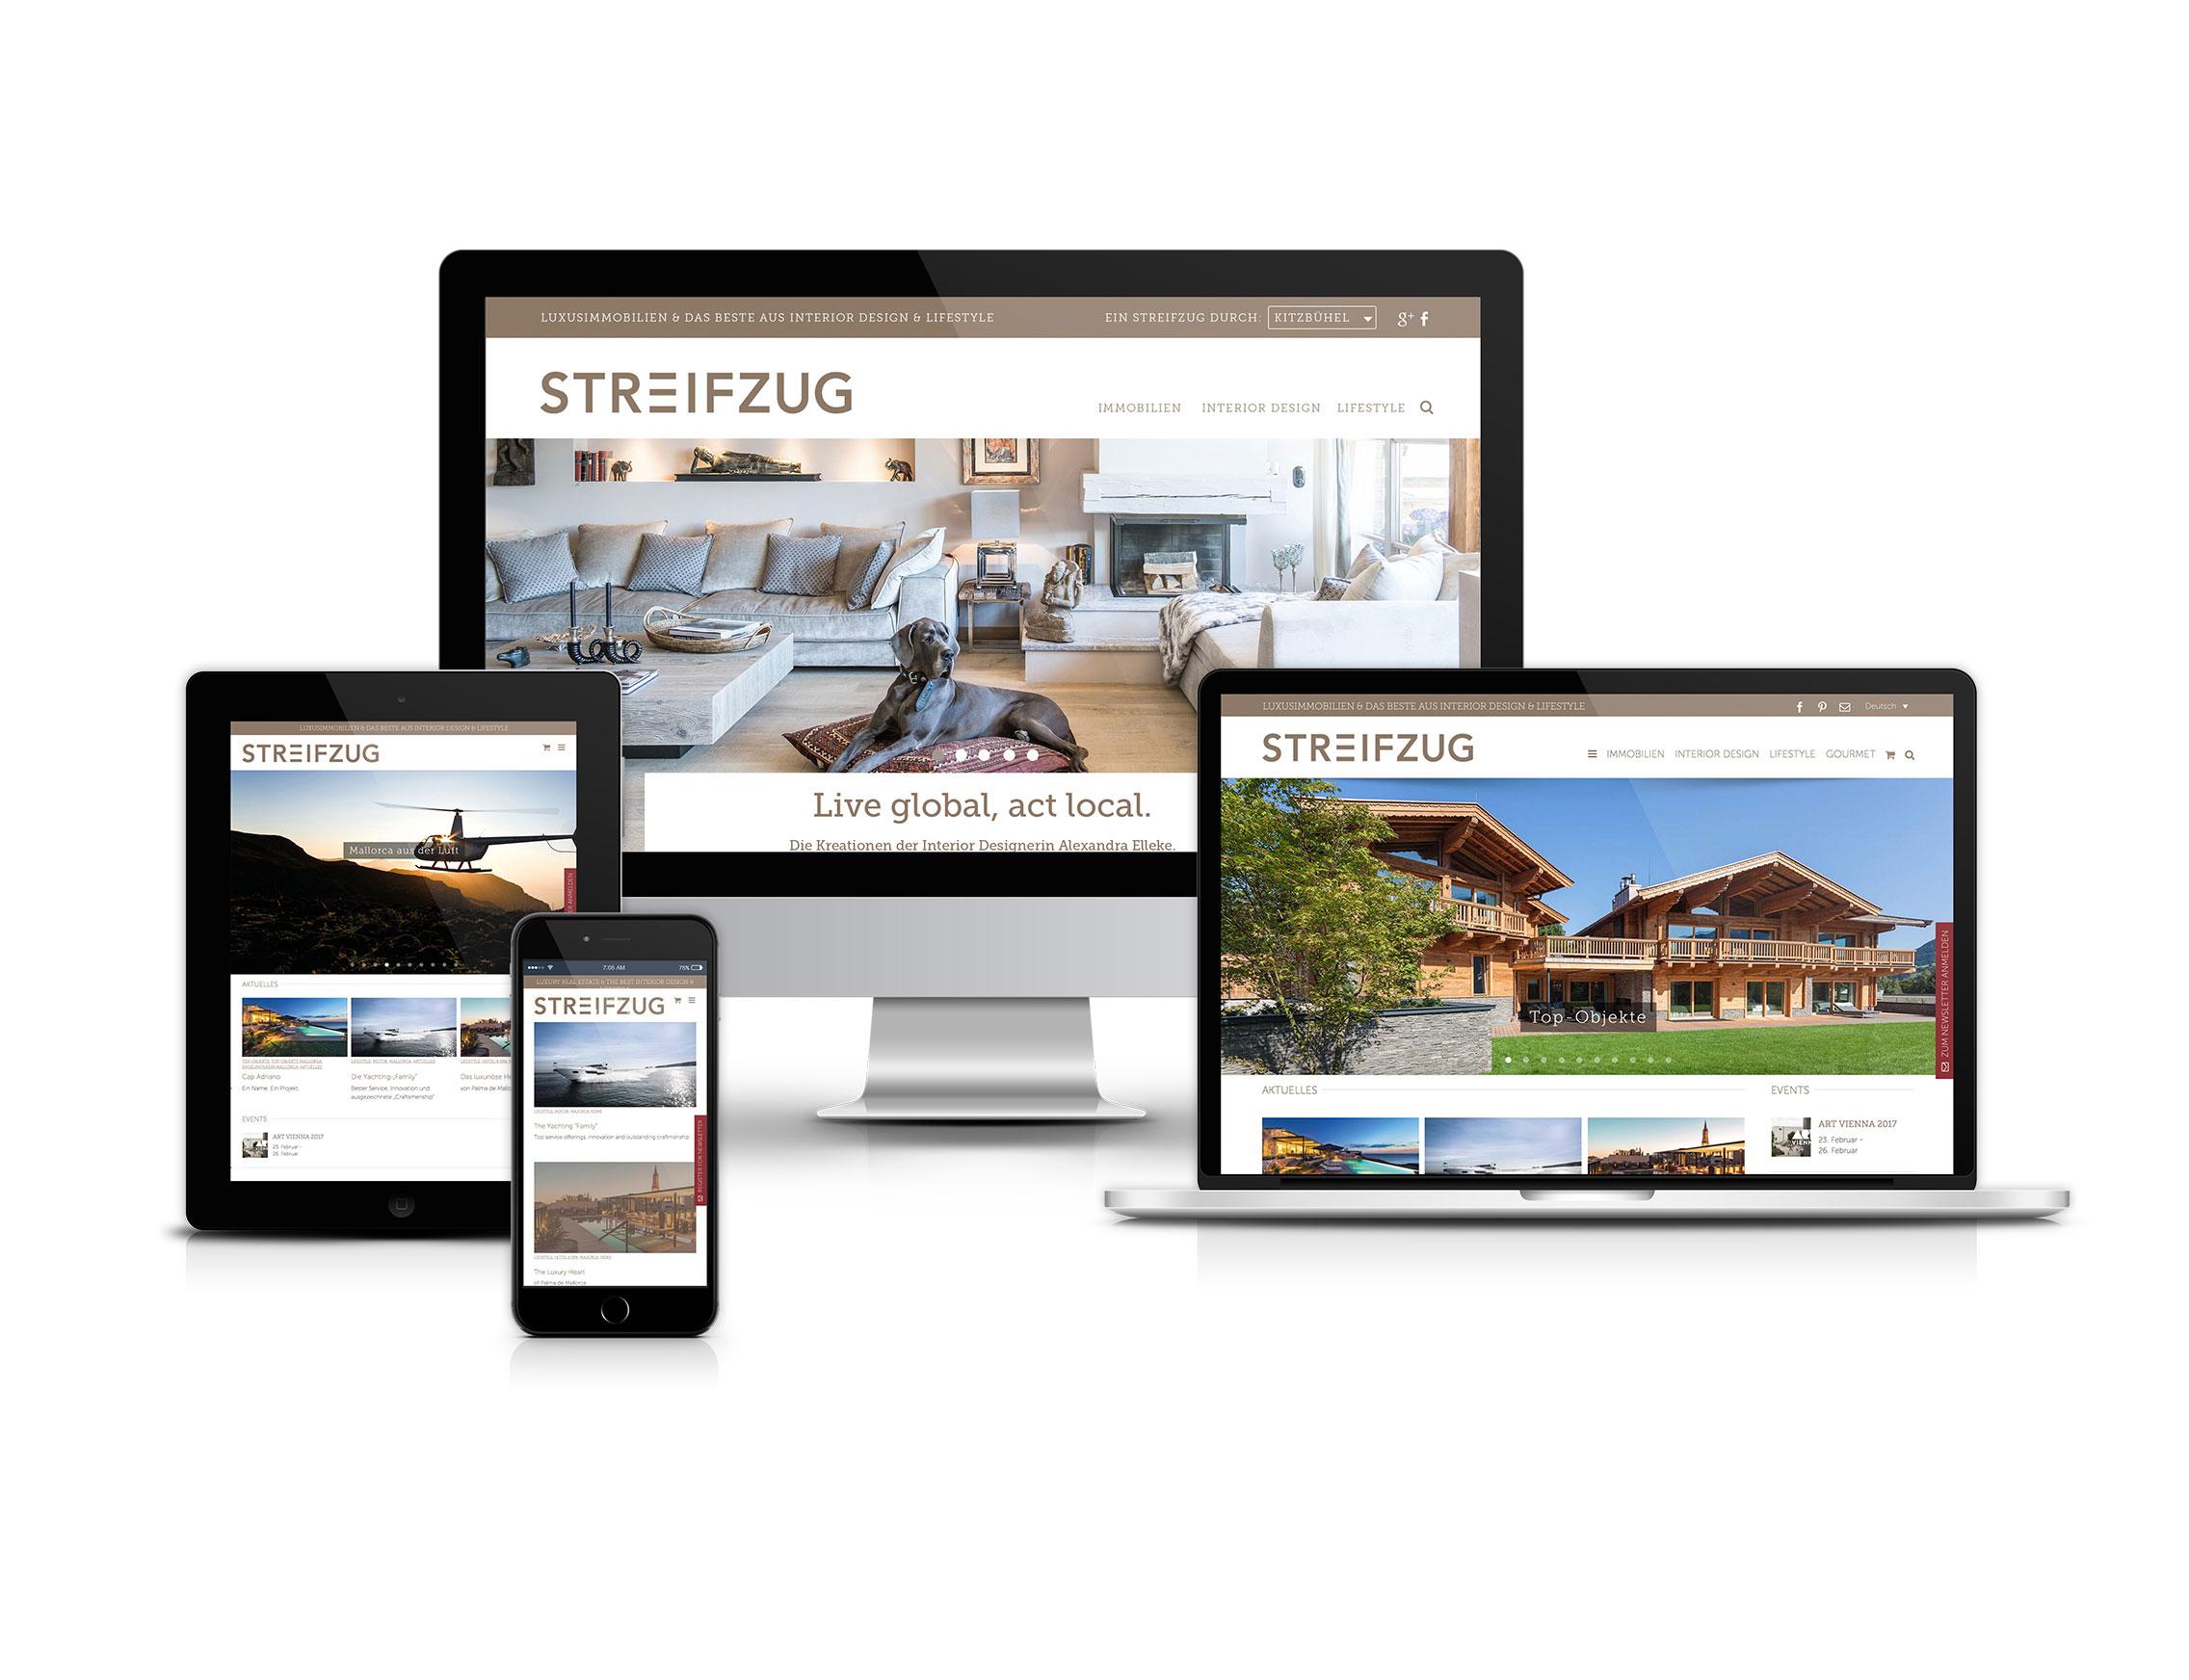 STREIFZUG – UNIQUE - Conception & Communication Agency